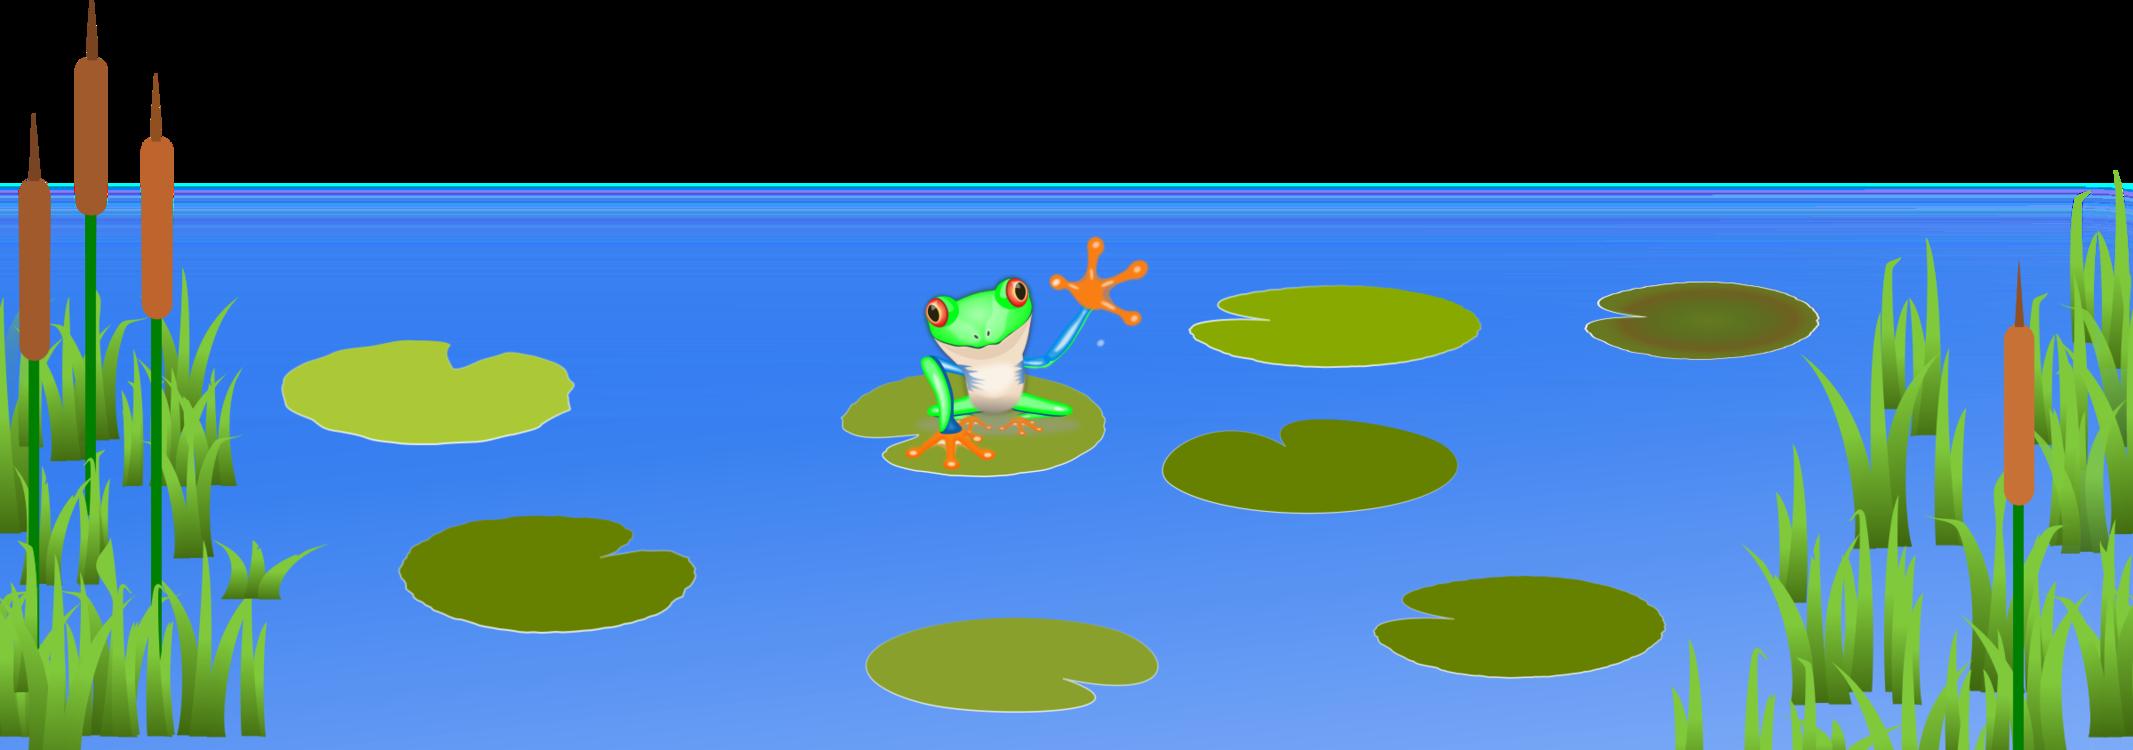 CLIPART POND | Royalty free vector design | Landscape illustration,  Background clipart, Scene